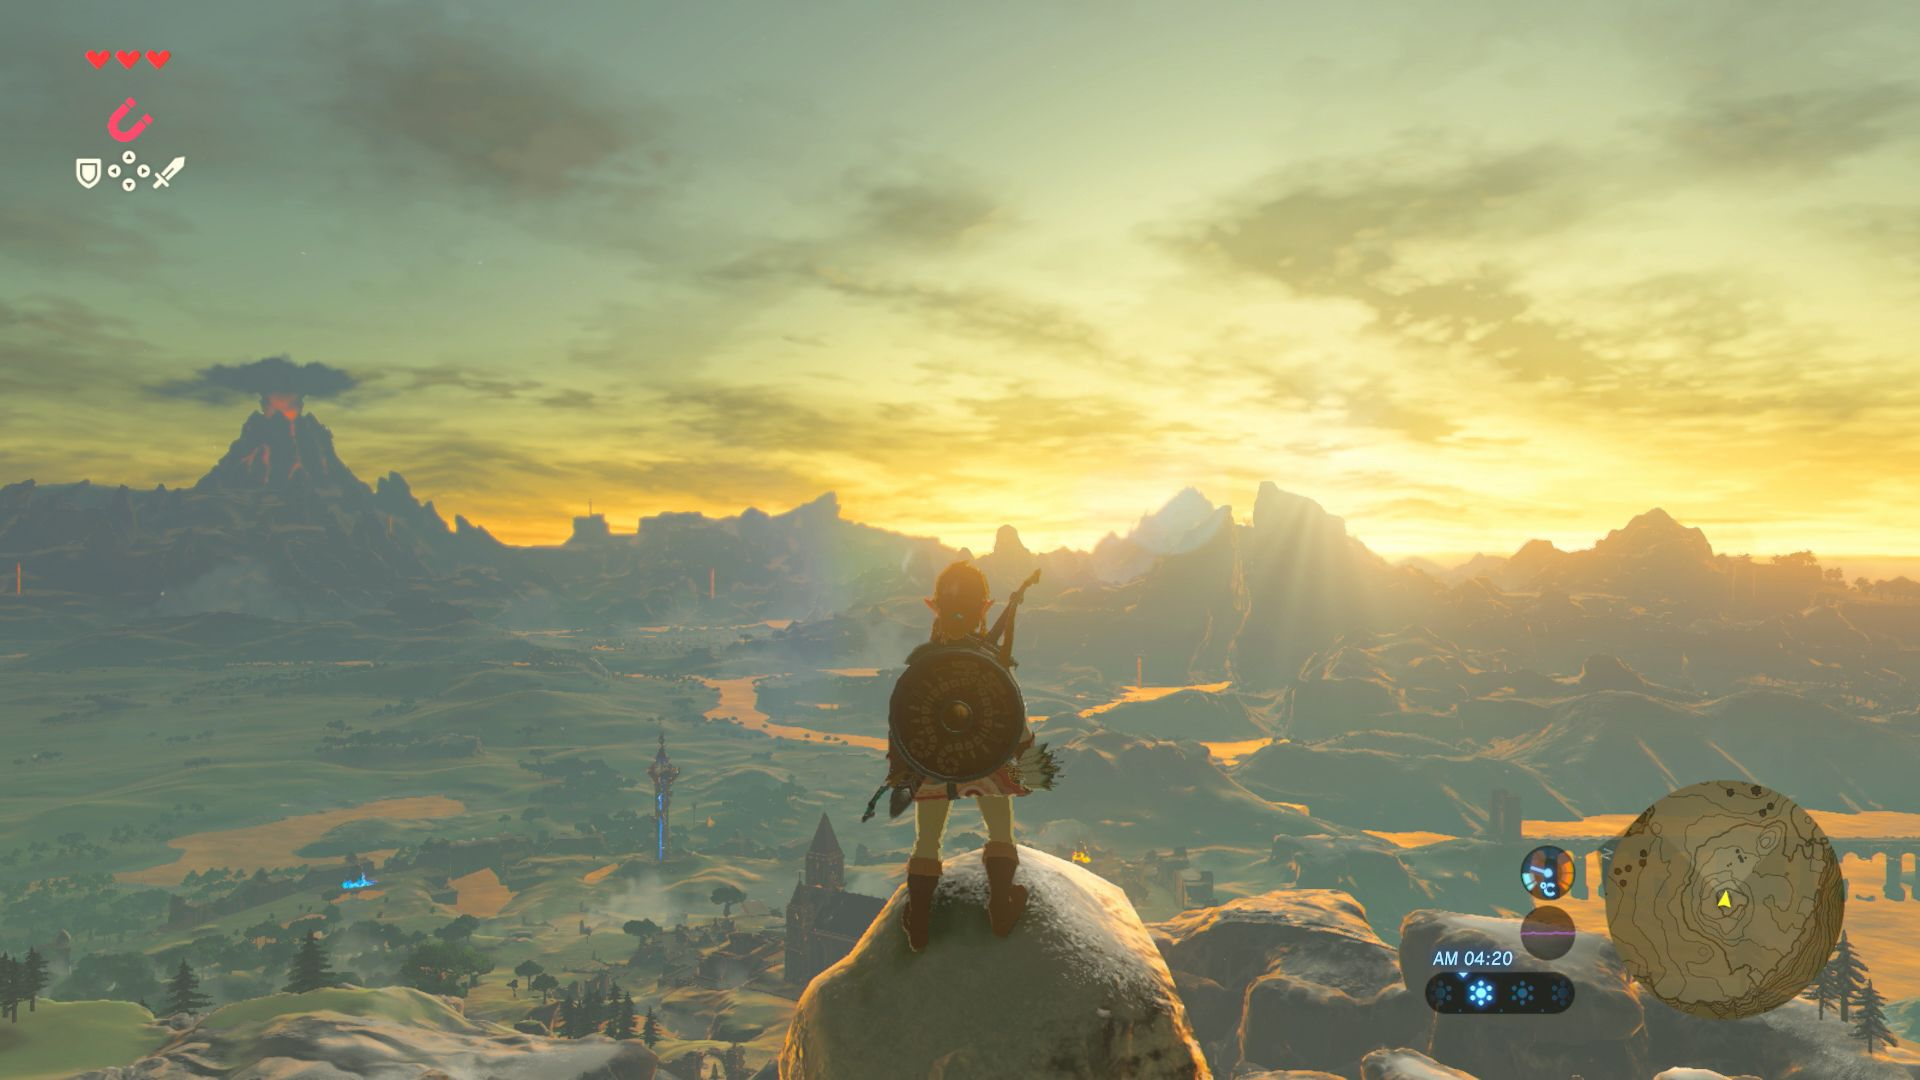 Zelda_Screenshot1.jpg